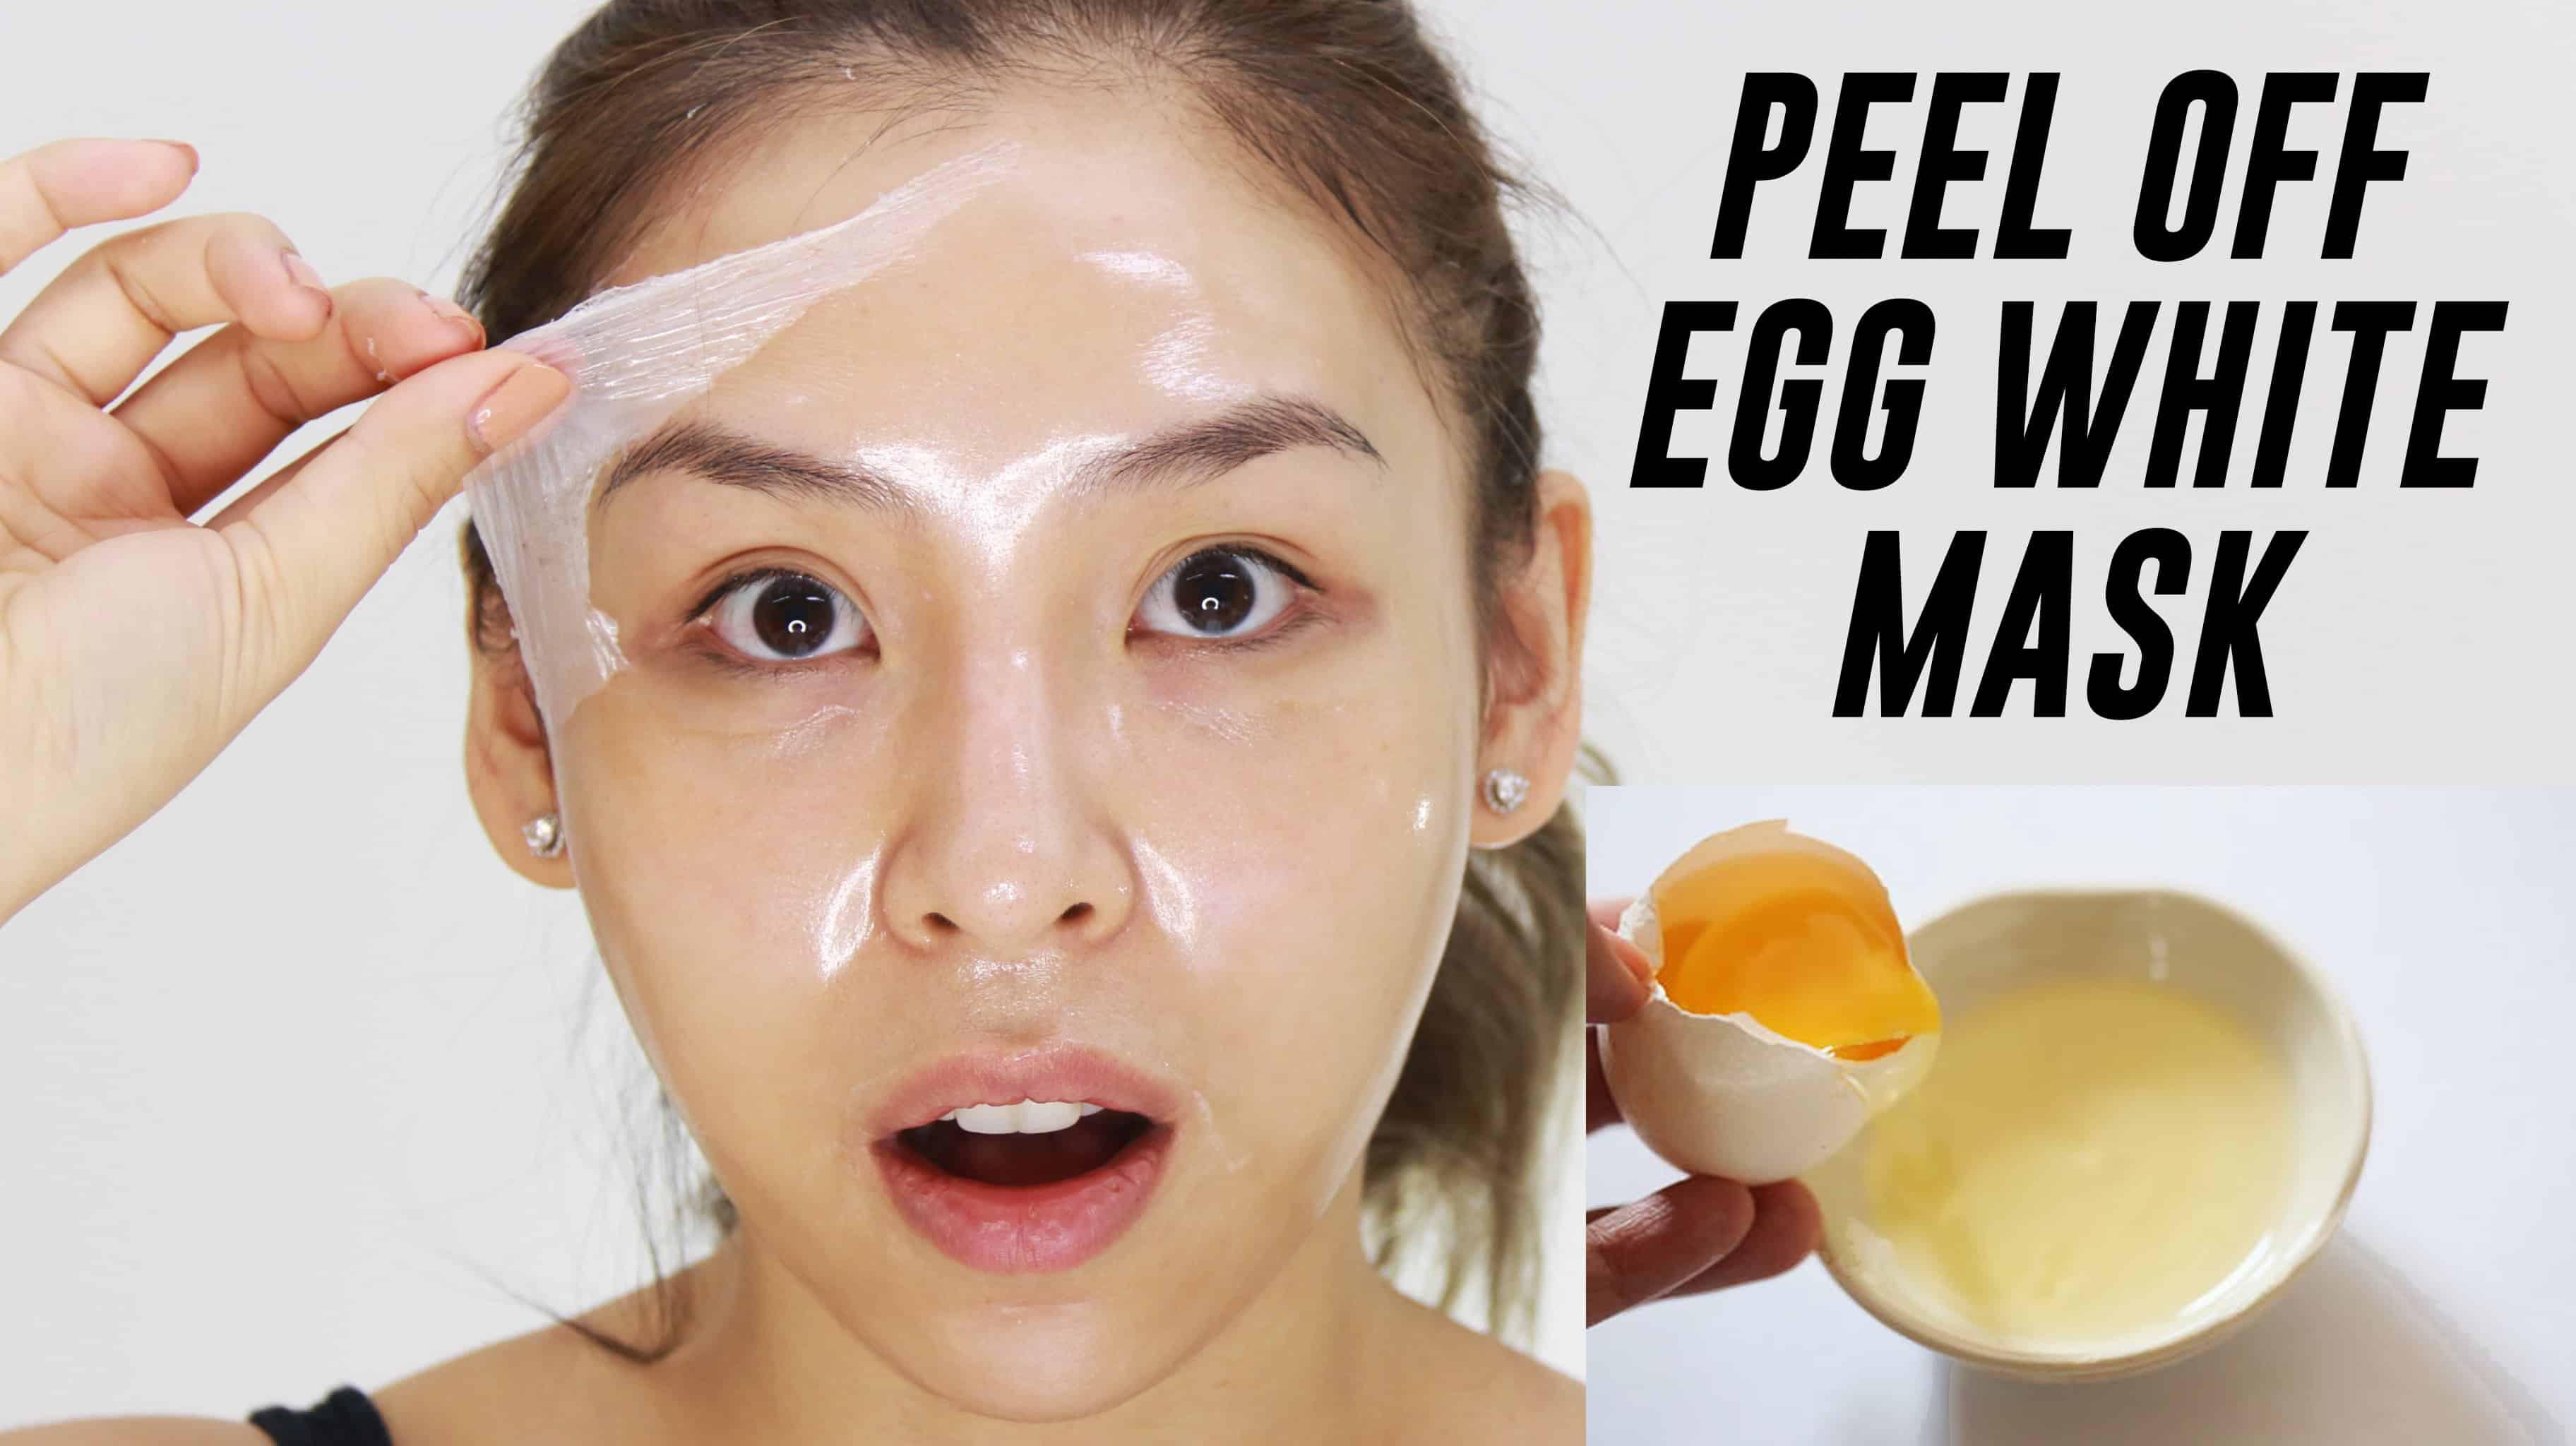 Best ideas about DIY Peel Off Face Mask With Egg . Save or Pin Efek Samping Memakai Masker Putih Telur Setiap Hari Now.